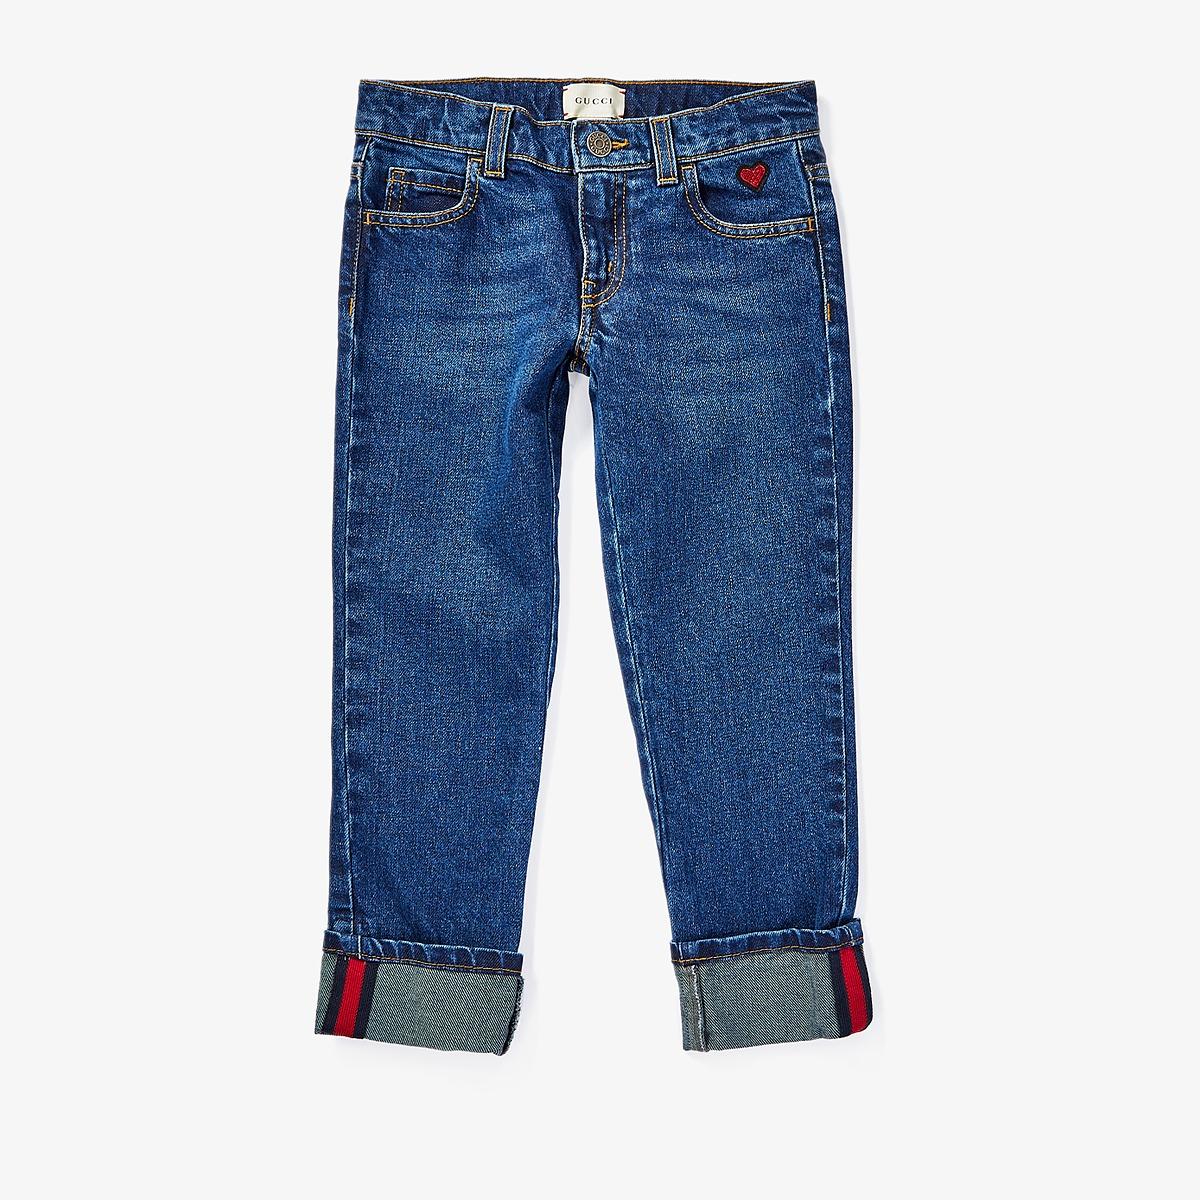 Gucci Kids - Denim in Orbit/Blue/Red 457165XR435 (Little Kids/Big Kids) (Orbit/Blue/Red) Girls Jeans